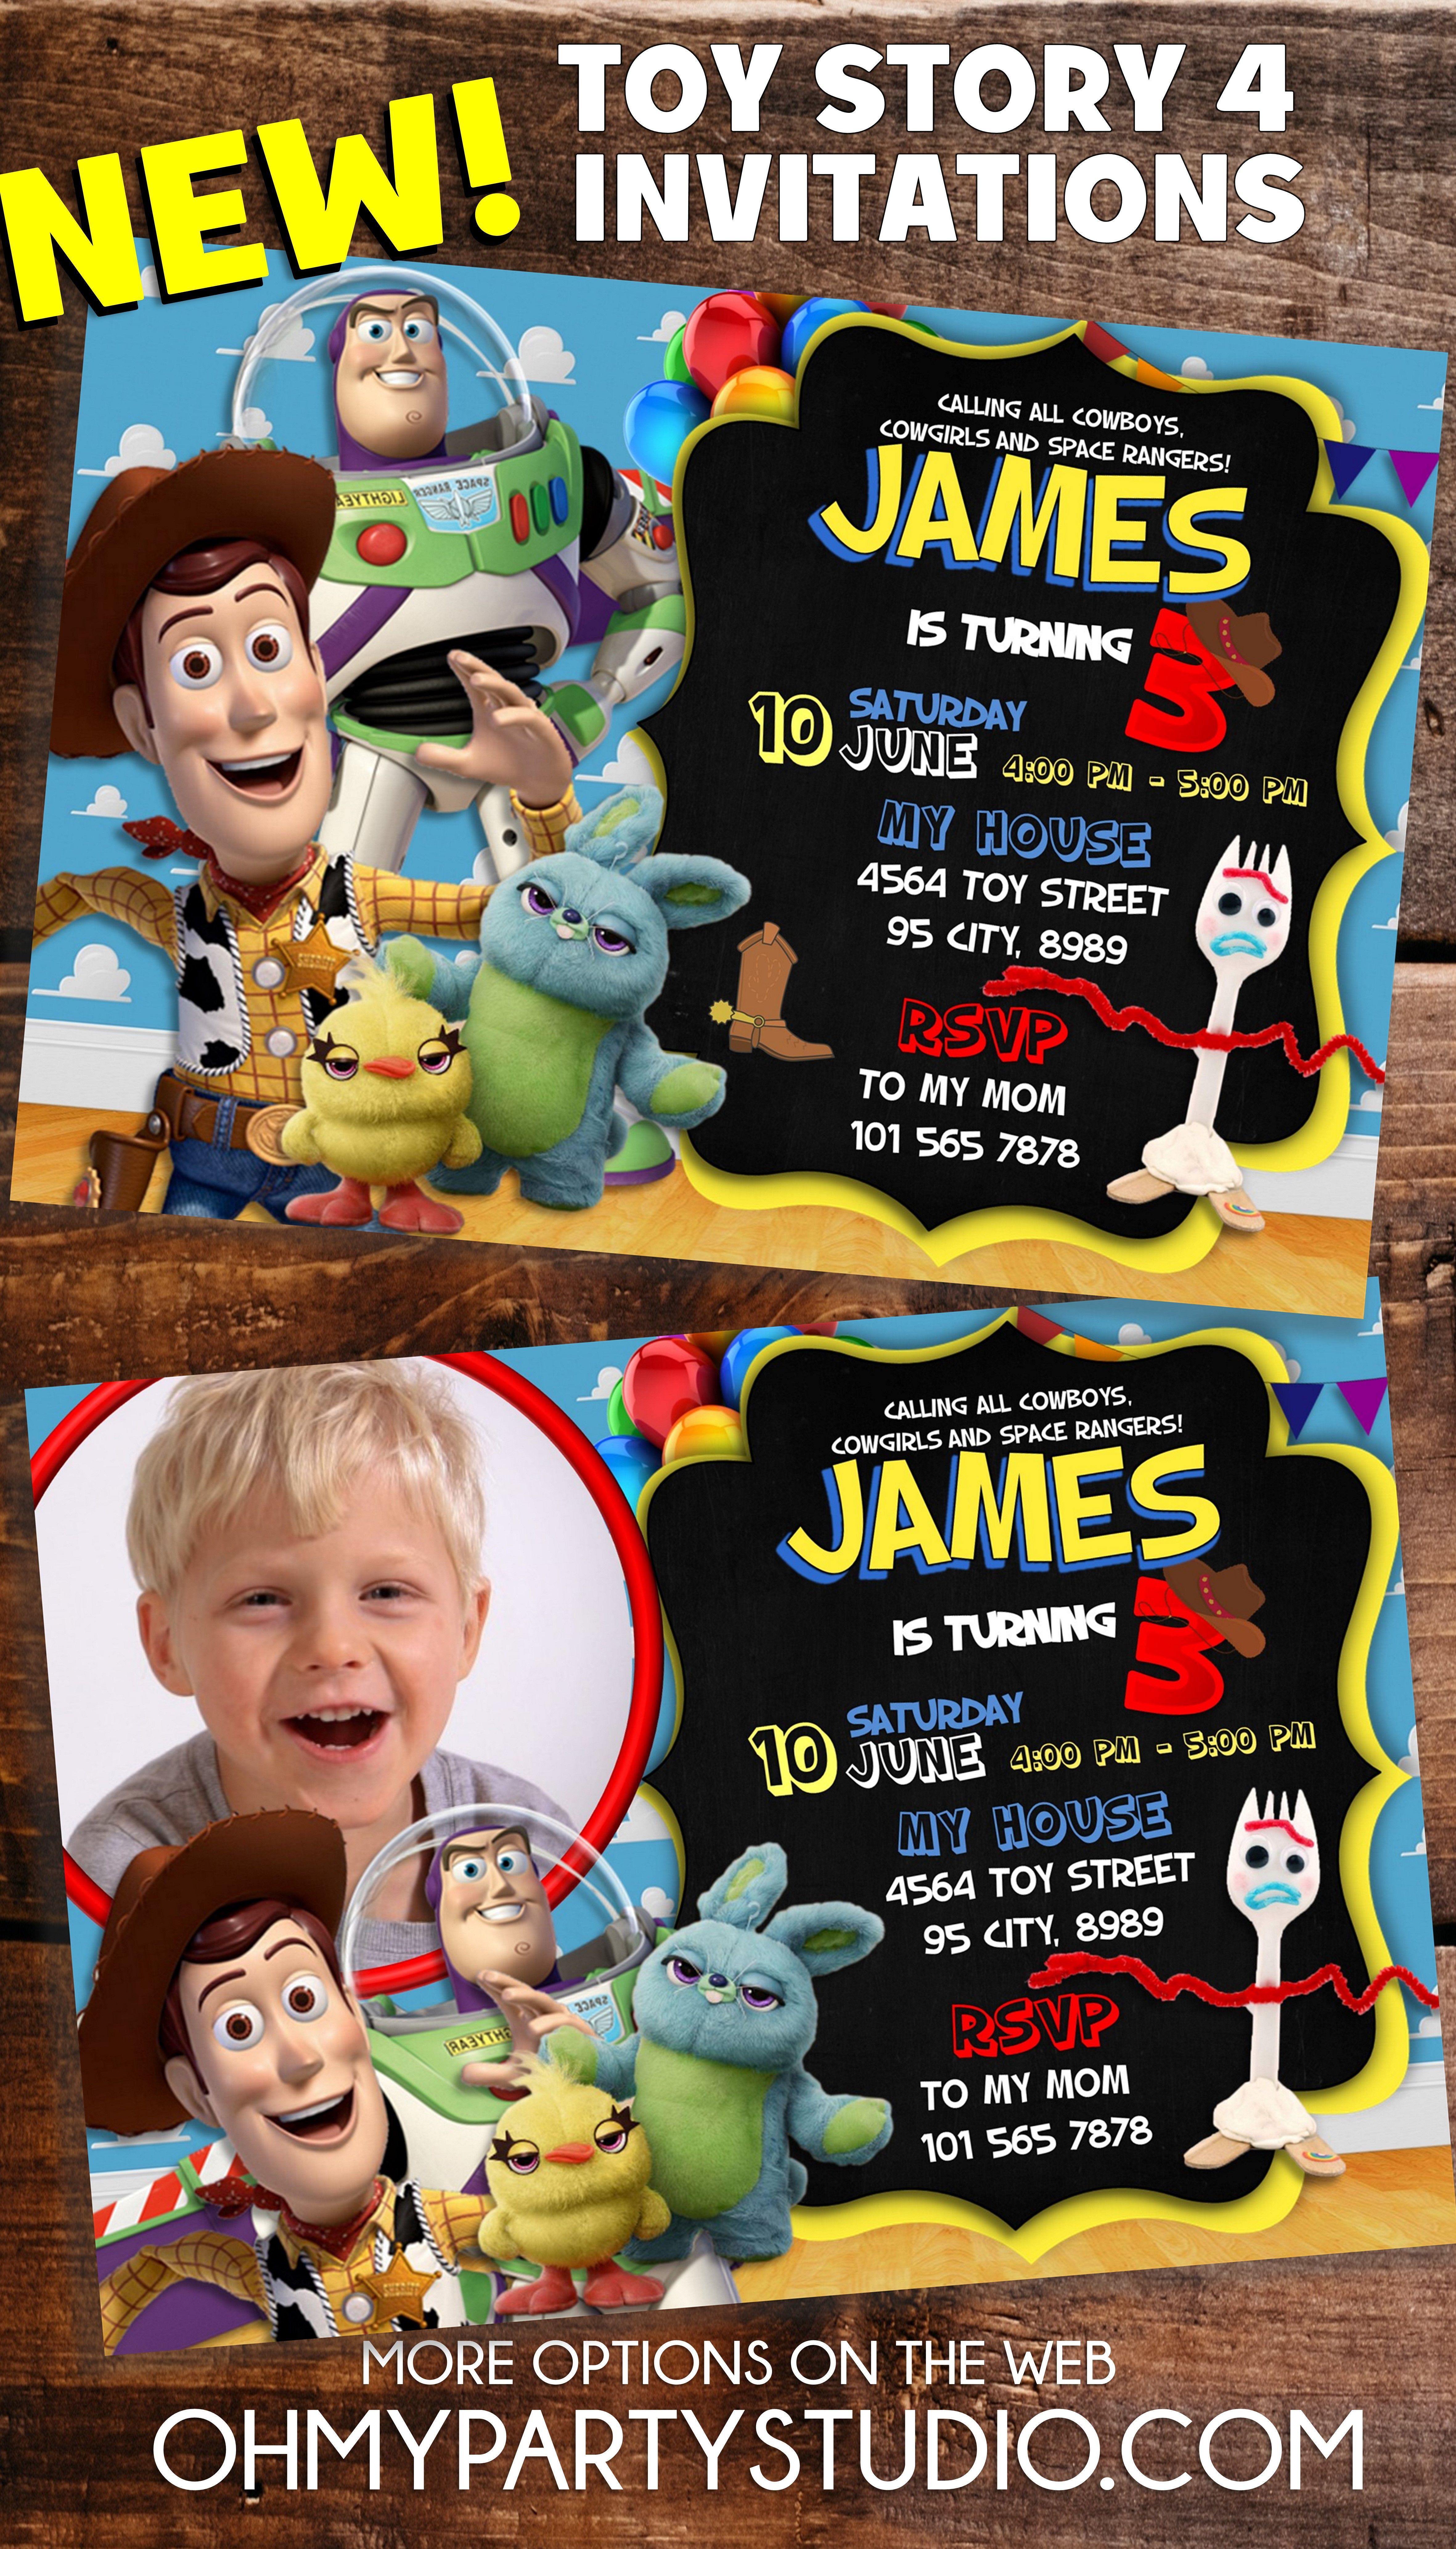 Toy Story 4 Birthday Invitation Toy Story Party Ideas Toy